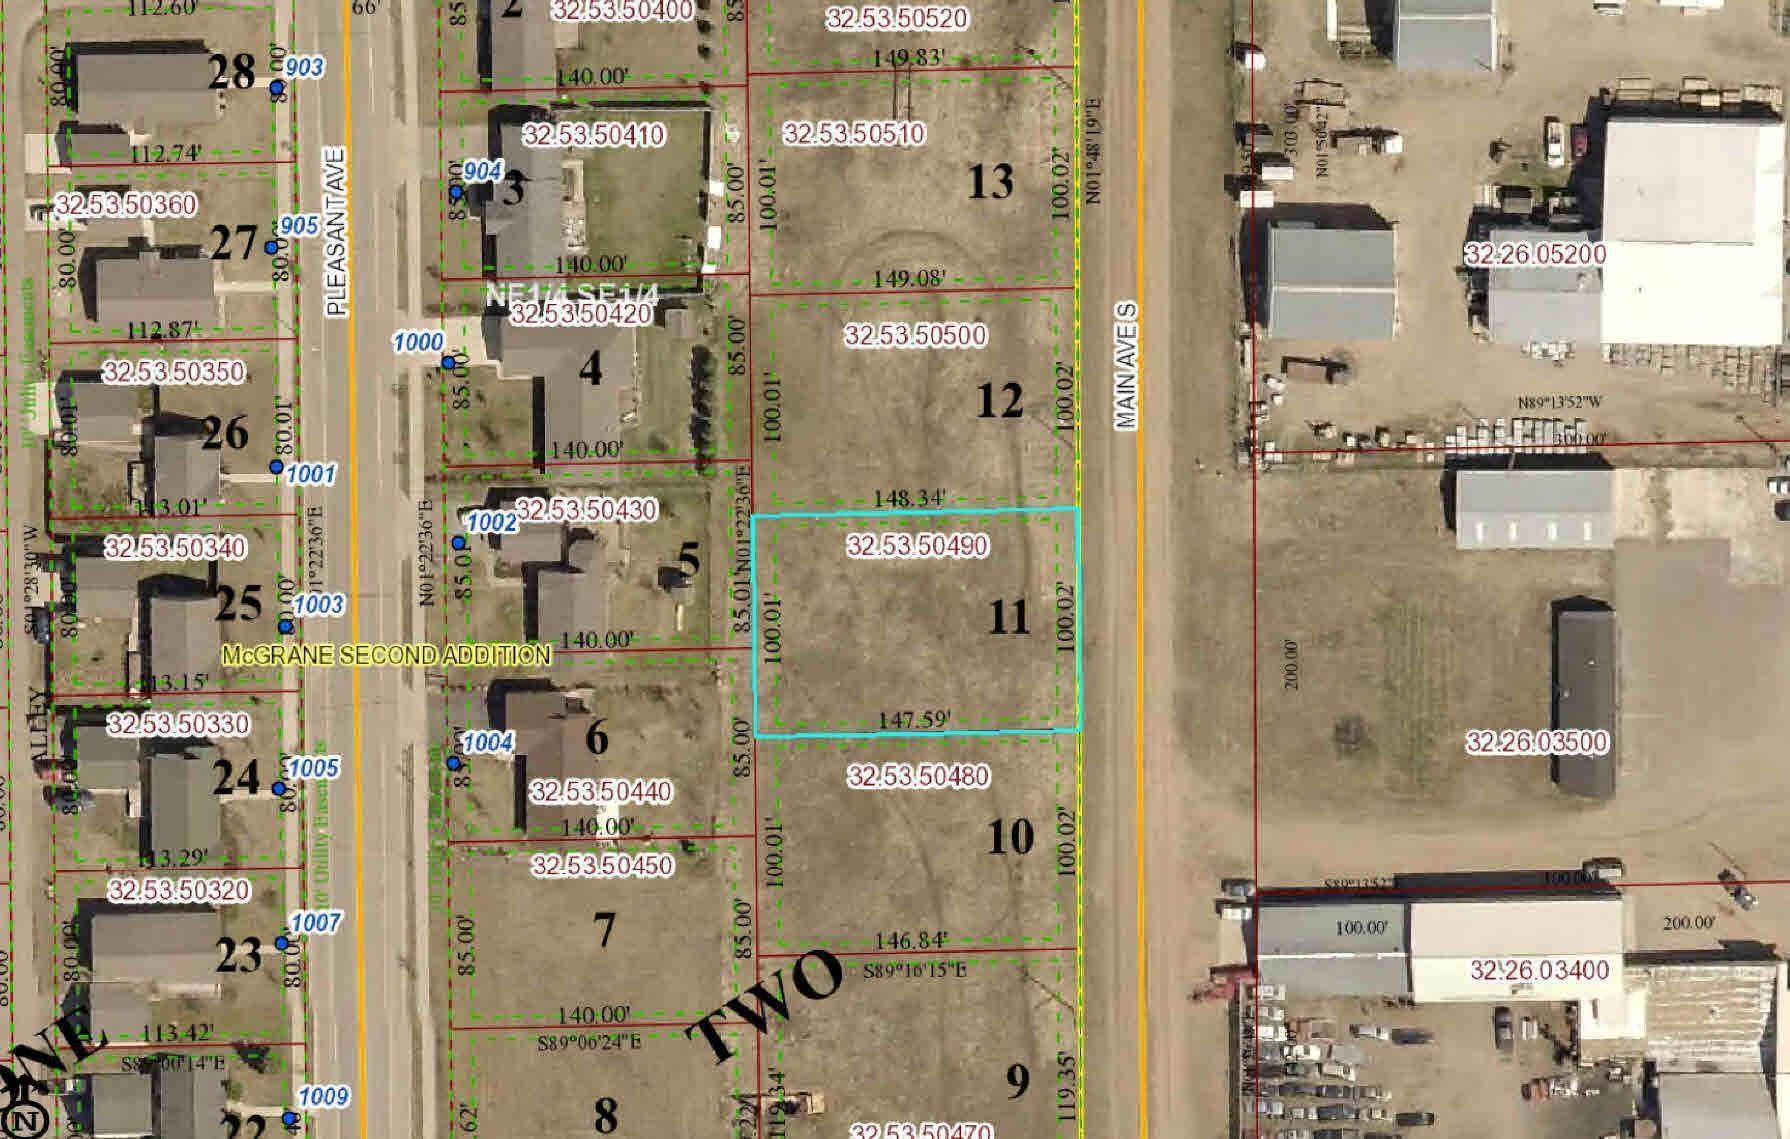 1003 Main Avenue S, Park Rapids, MN 56470